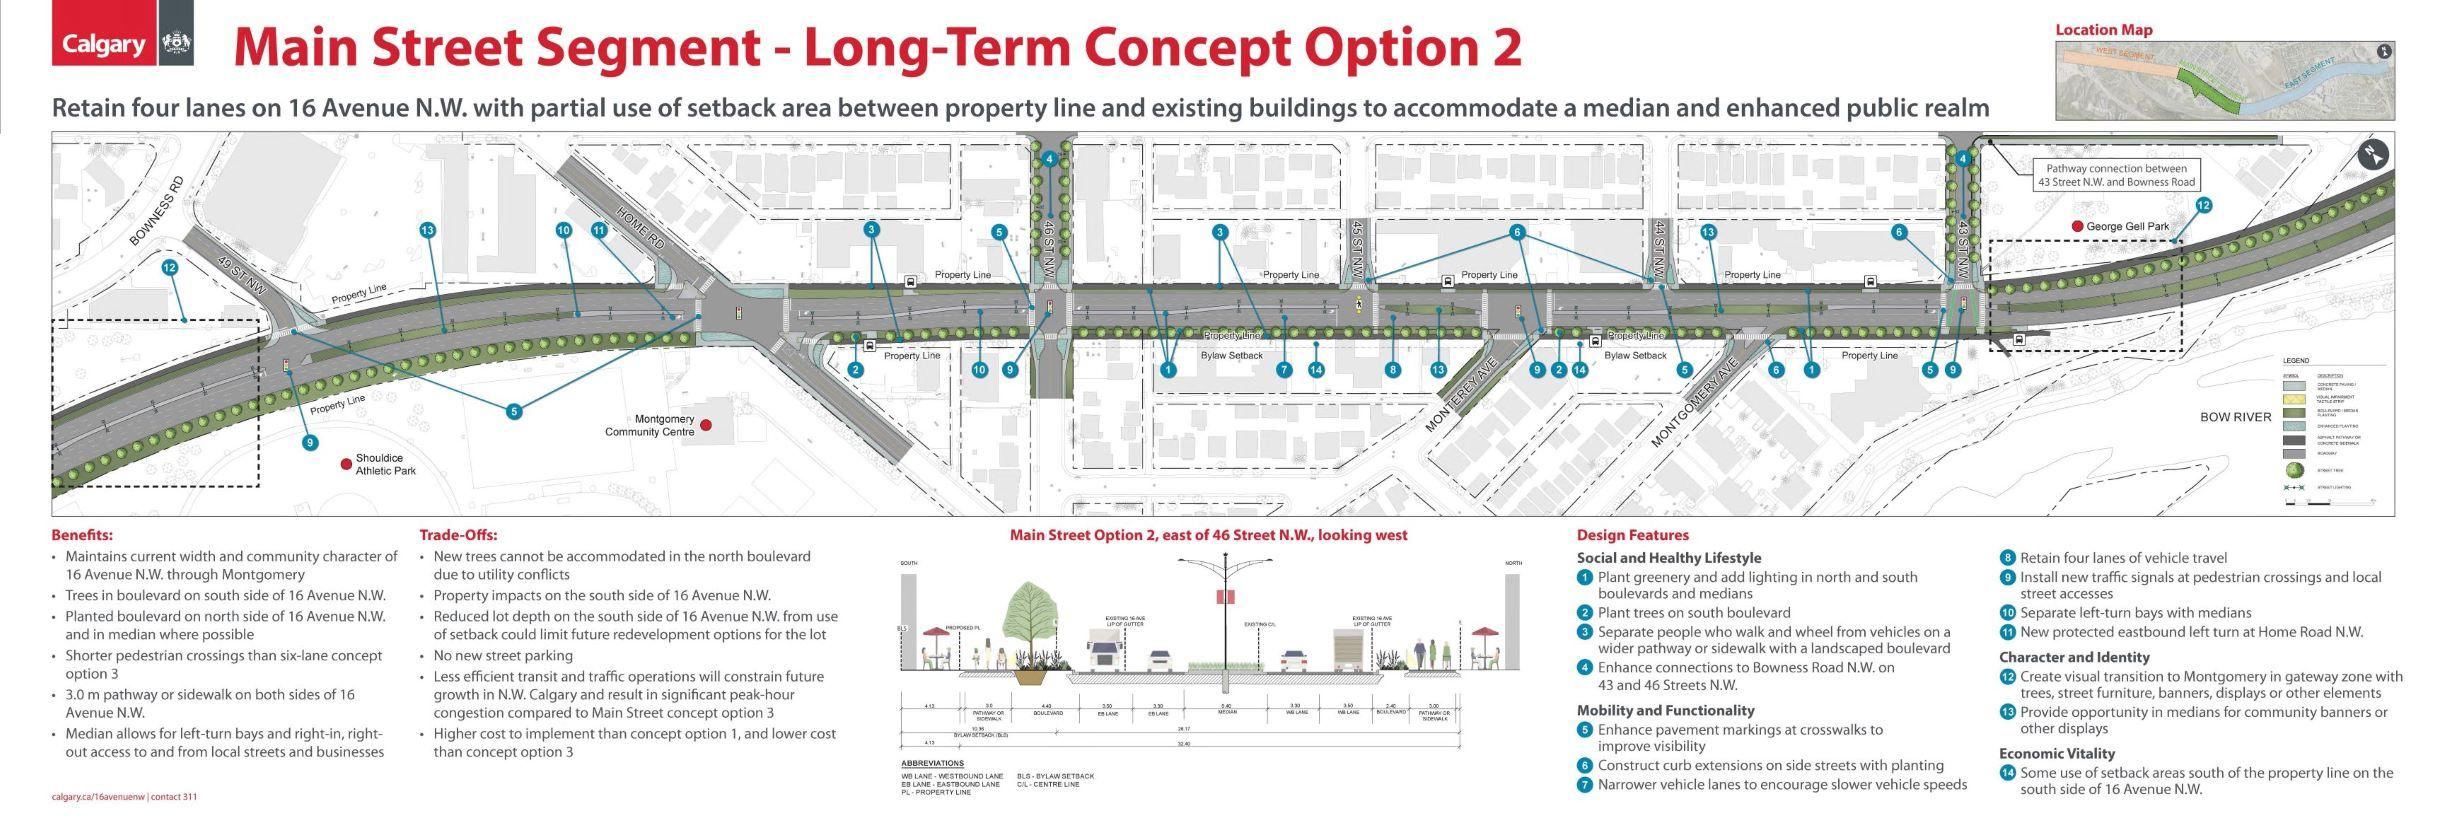 Main Street Segment Option 2